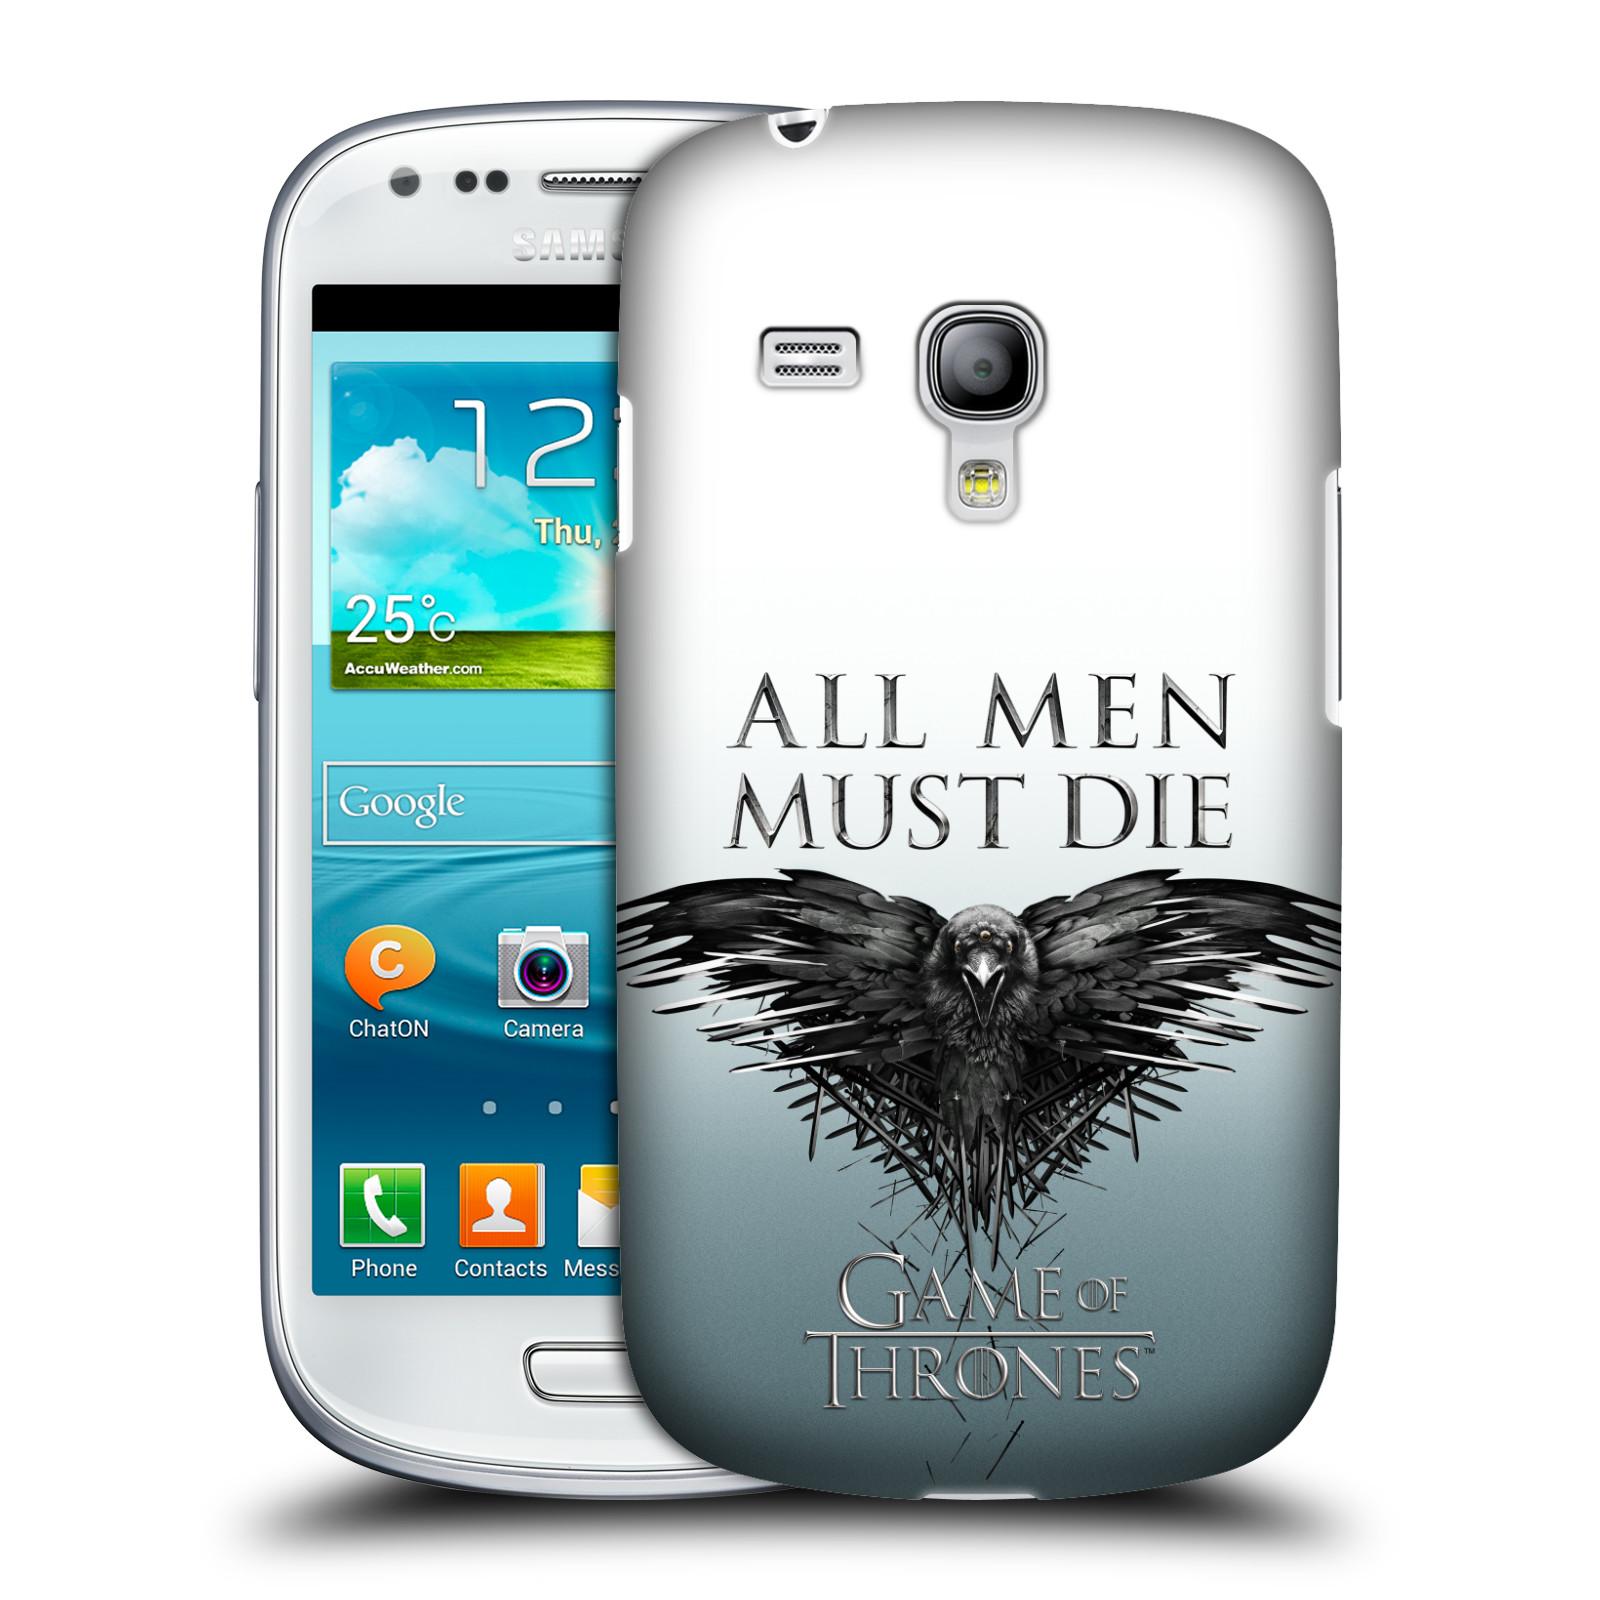 Plastové pouzdro na mobil Samsung Galaxy S III Mini VE HEAD CASE Hra o trůny - All men must die (Kryt či obal na mobilní telefon s licencovaným motivem Hra o trůny / Game of Thrones pro Samsung Galaxy S3 Mini VE GT-i8200)